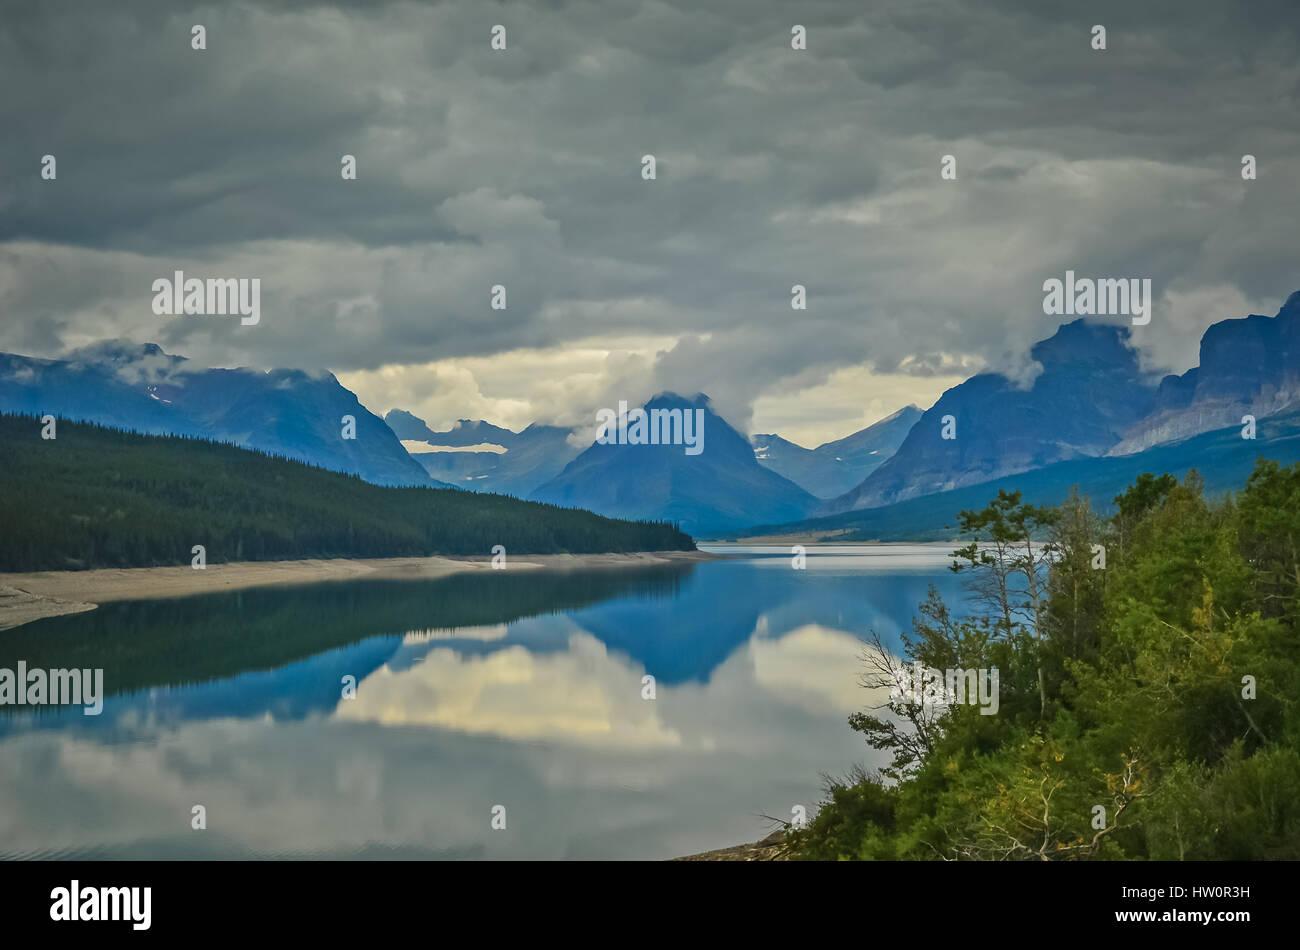 Swiftcurrent Lake & Many Glaciers Lodge in Glacier National Park, Montana, USA Stock Photo